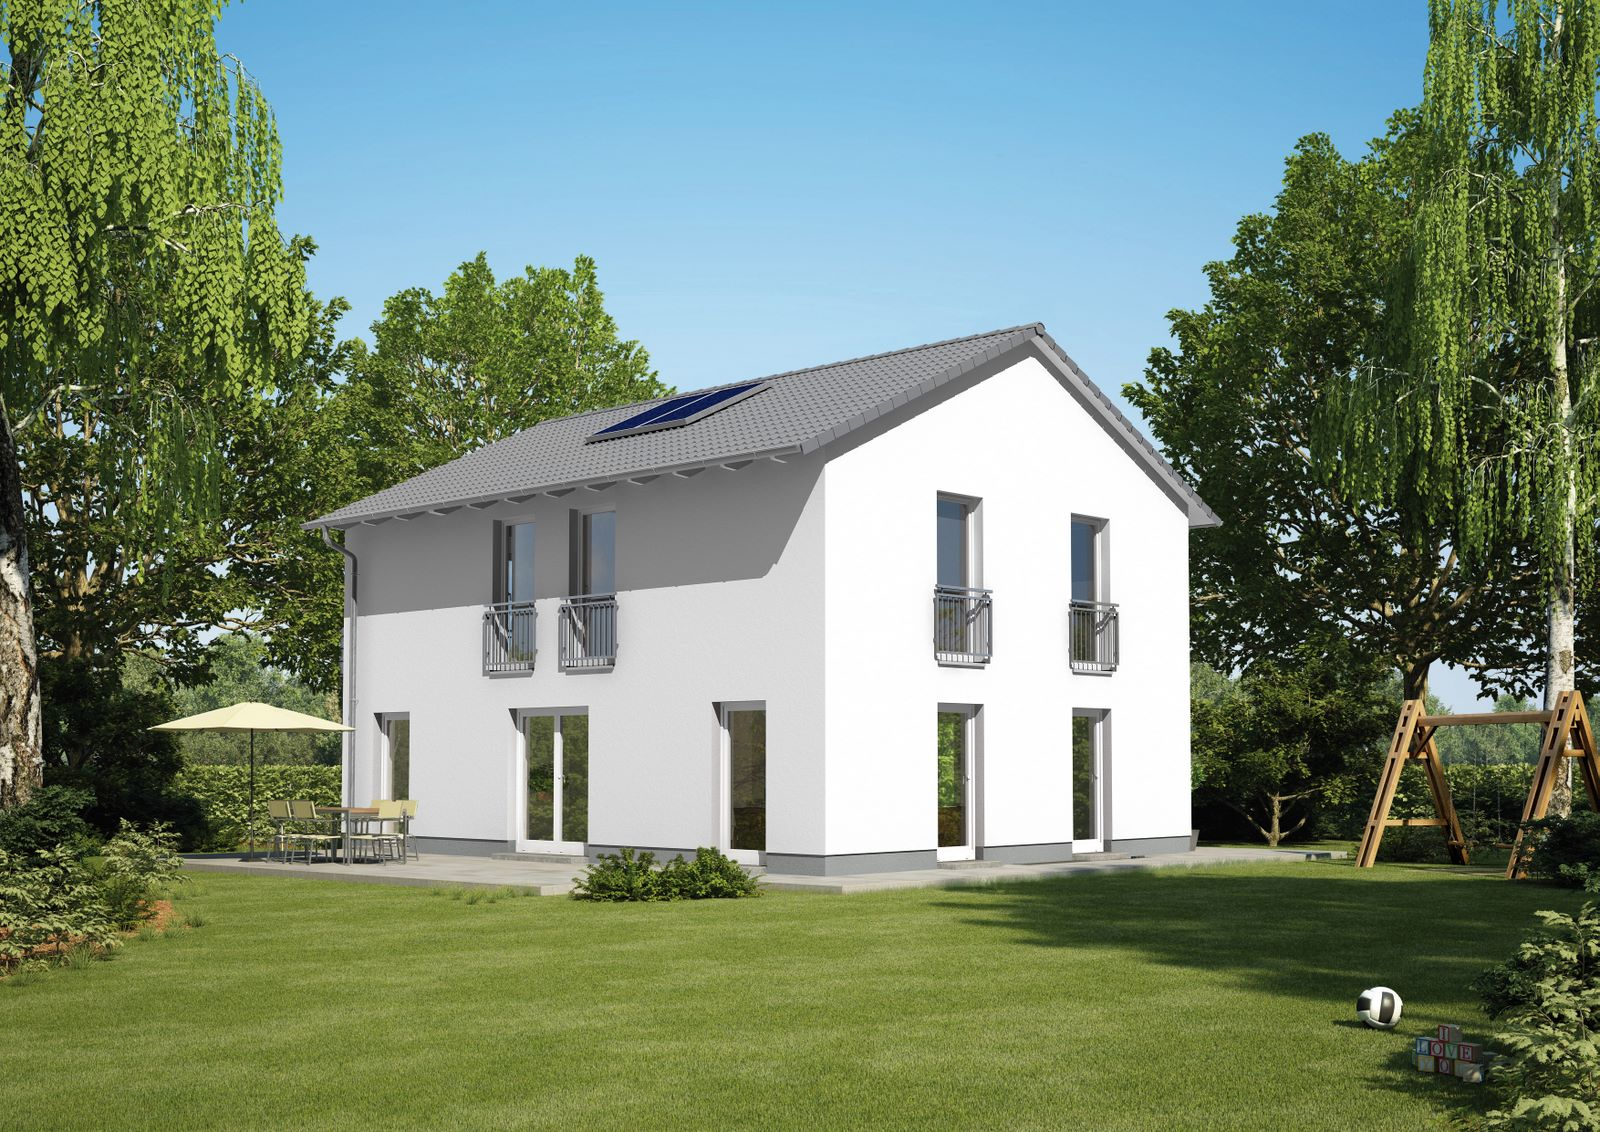 Vialla 166 var 1 energiesparhausplus for Grundriss einfamilienhaus 2 vollgeschosse